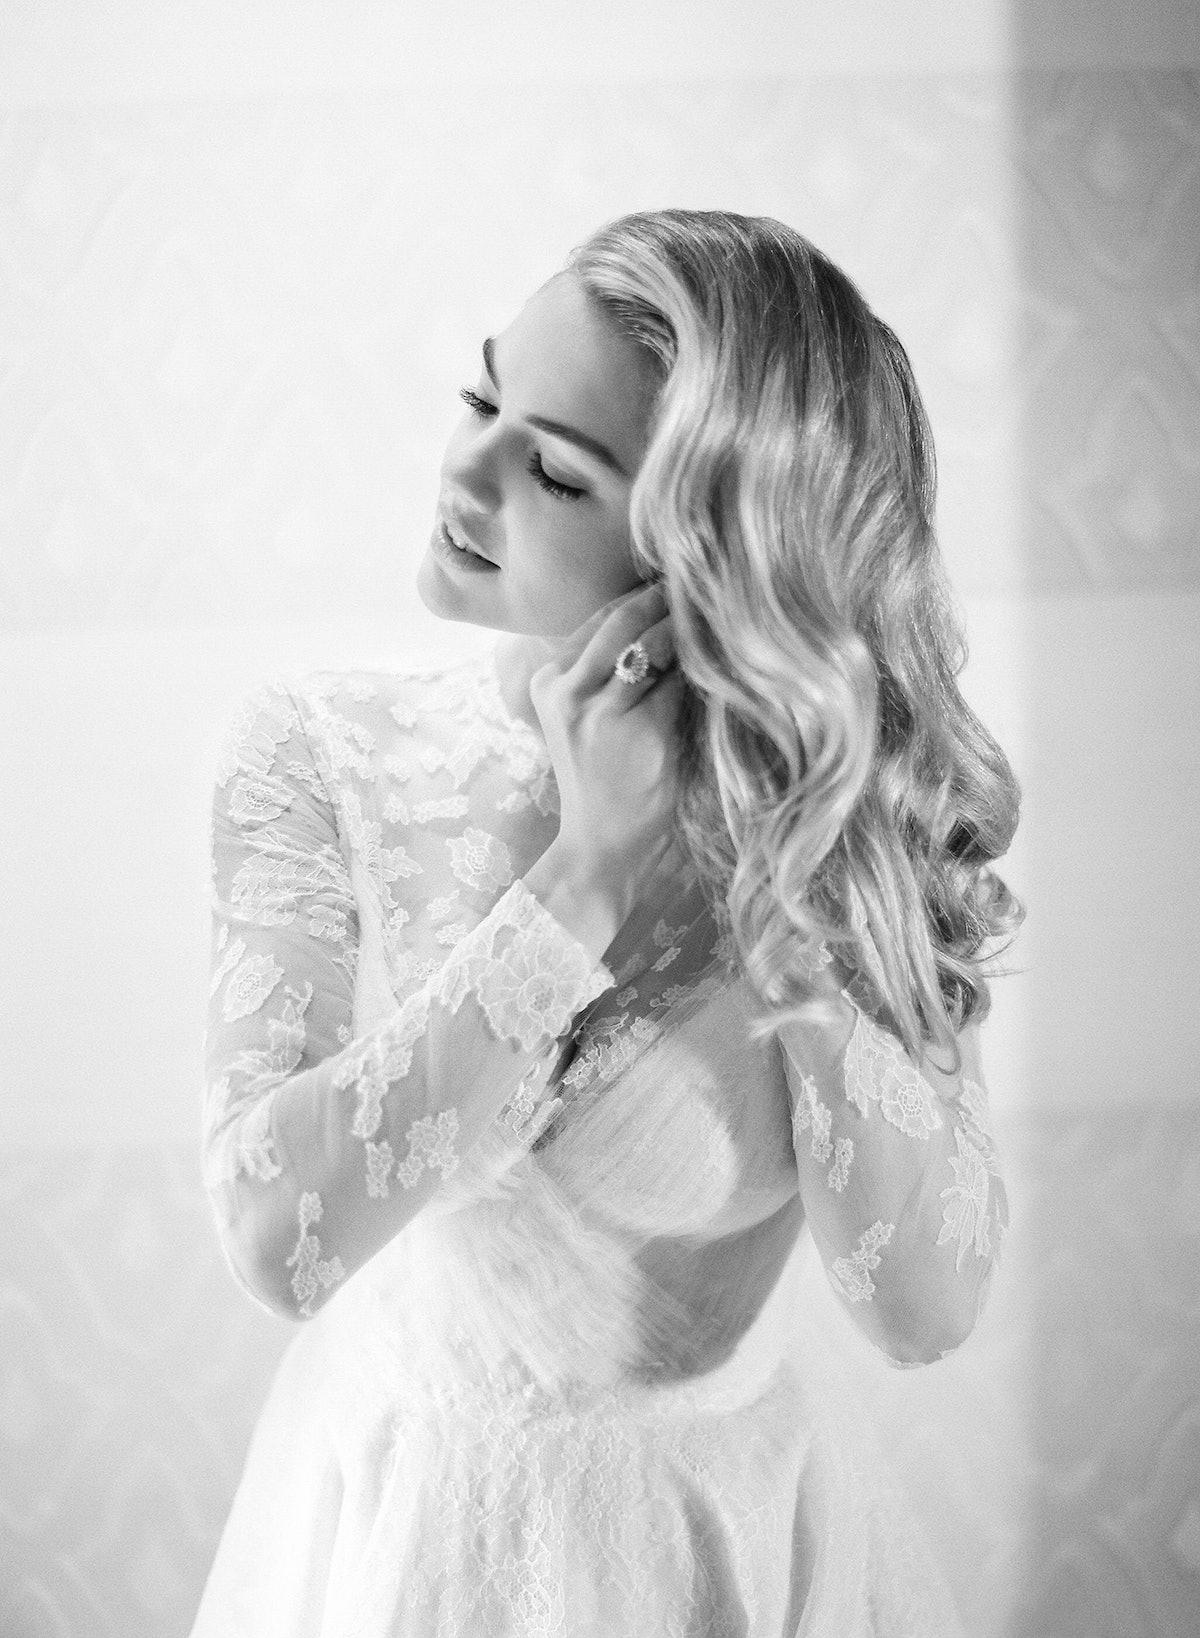 Kate Upton and Justin Verlander Wedding, Getting Ready